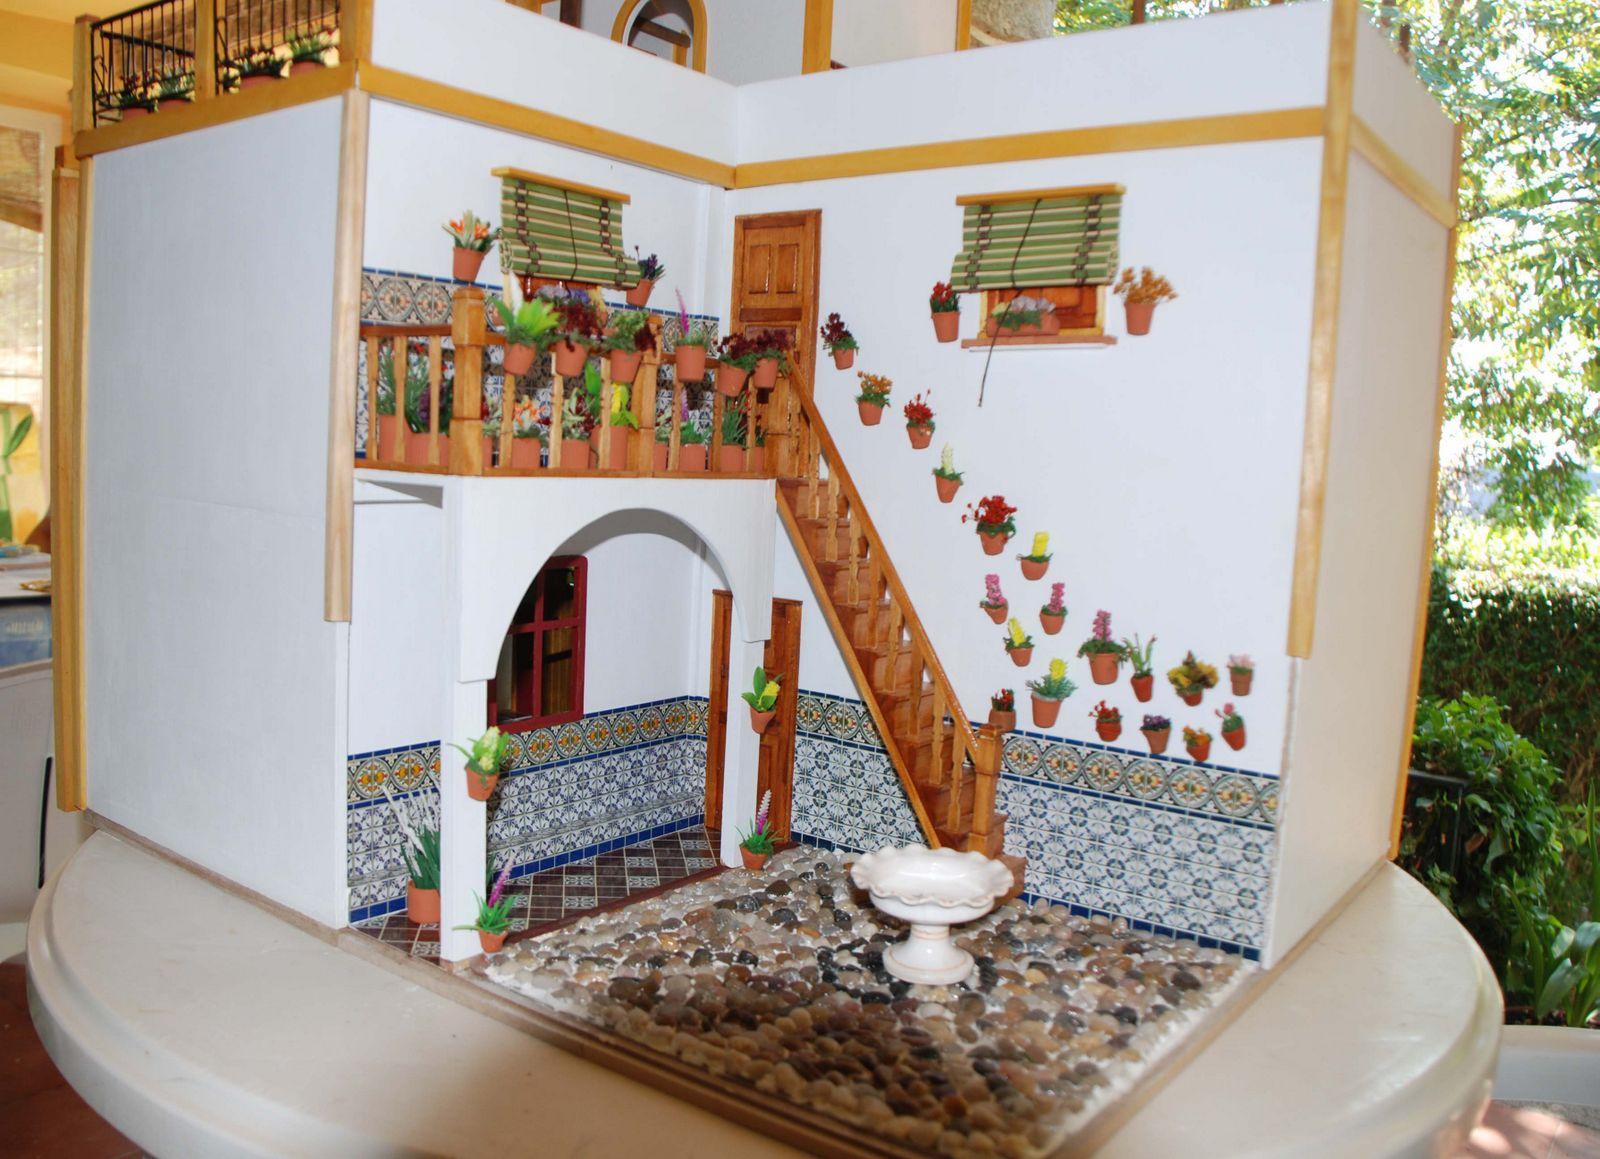 Minis y mas mi casa andaluza for Fotos de fachadas de casas andaluzas